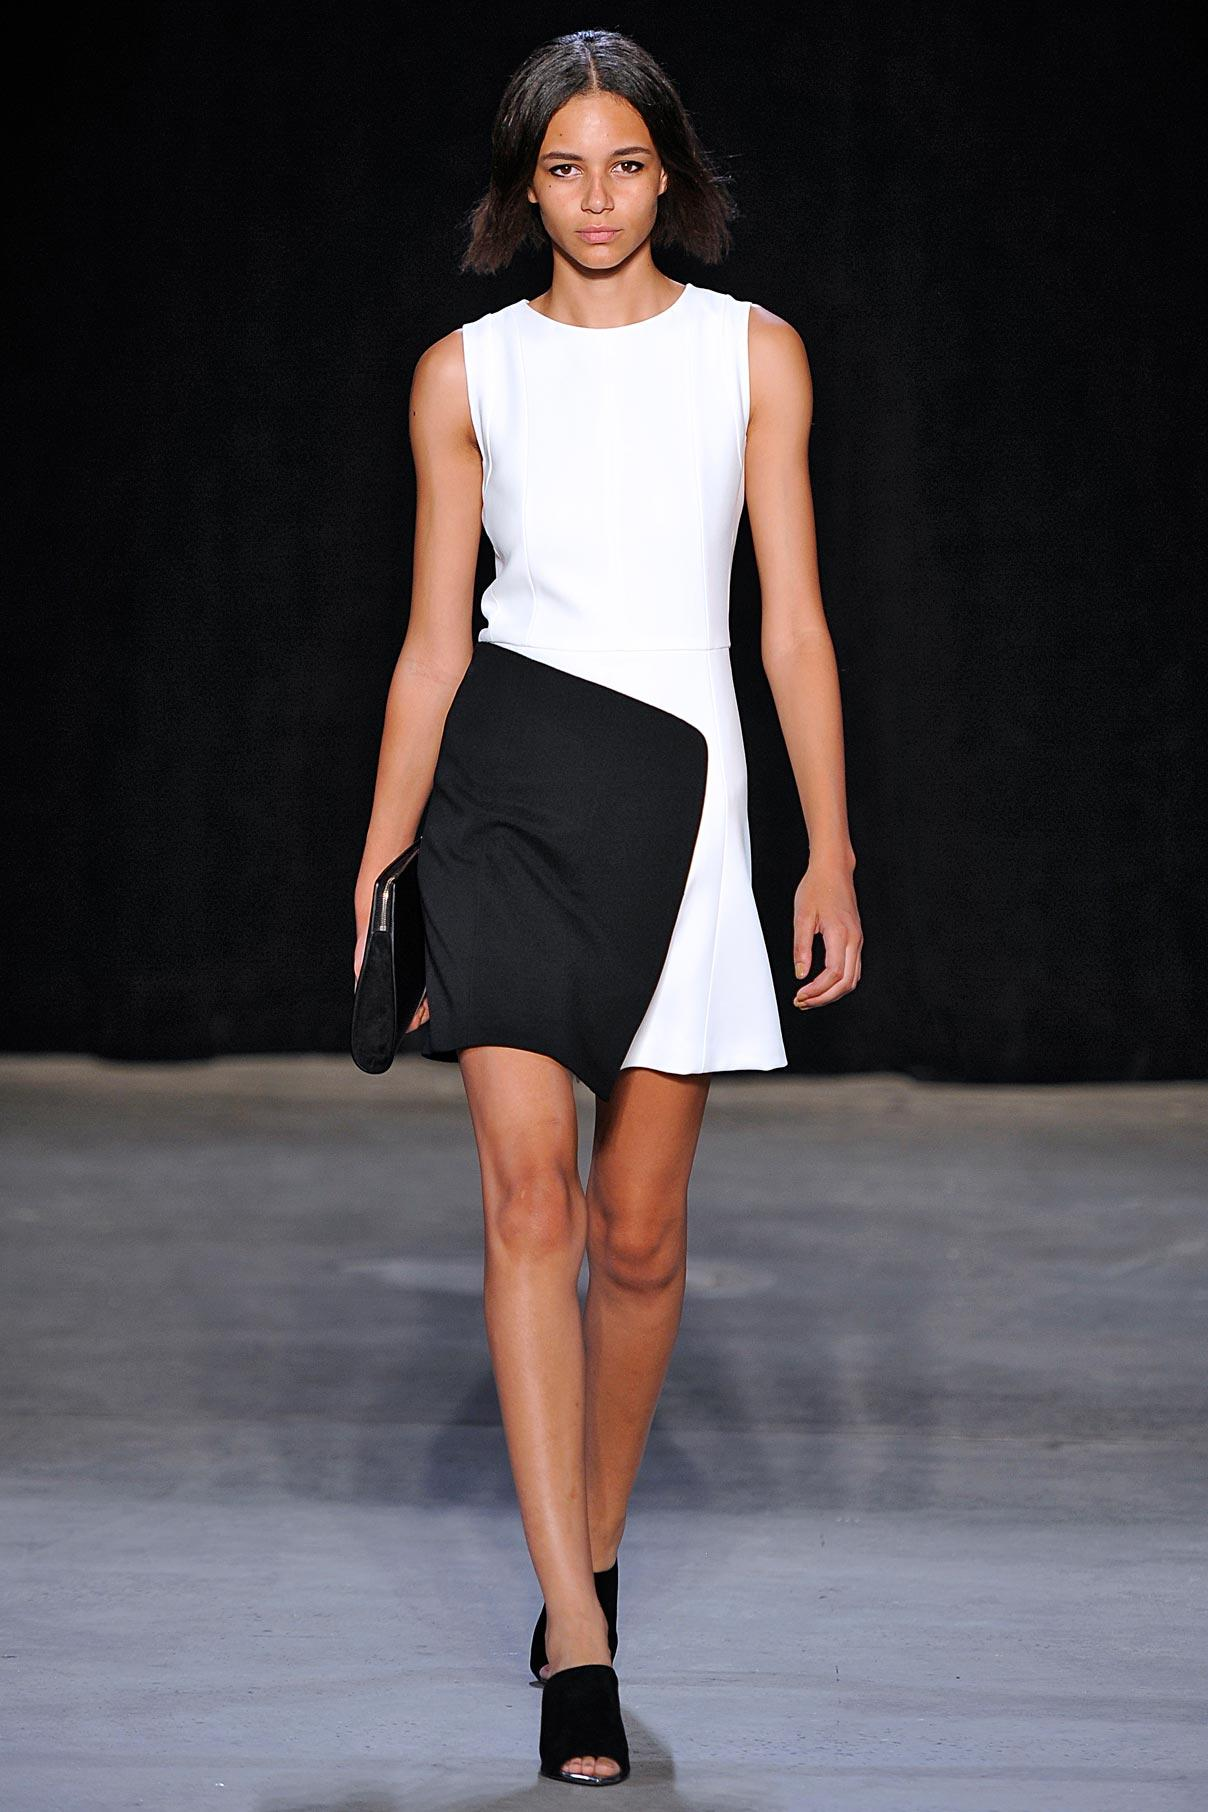 Look 21 Black/white bonded crepe dress.